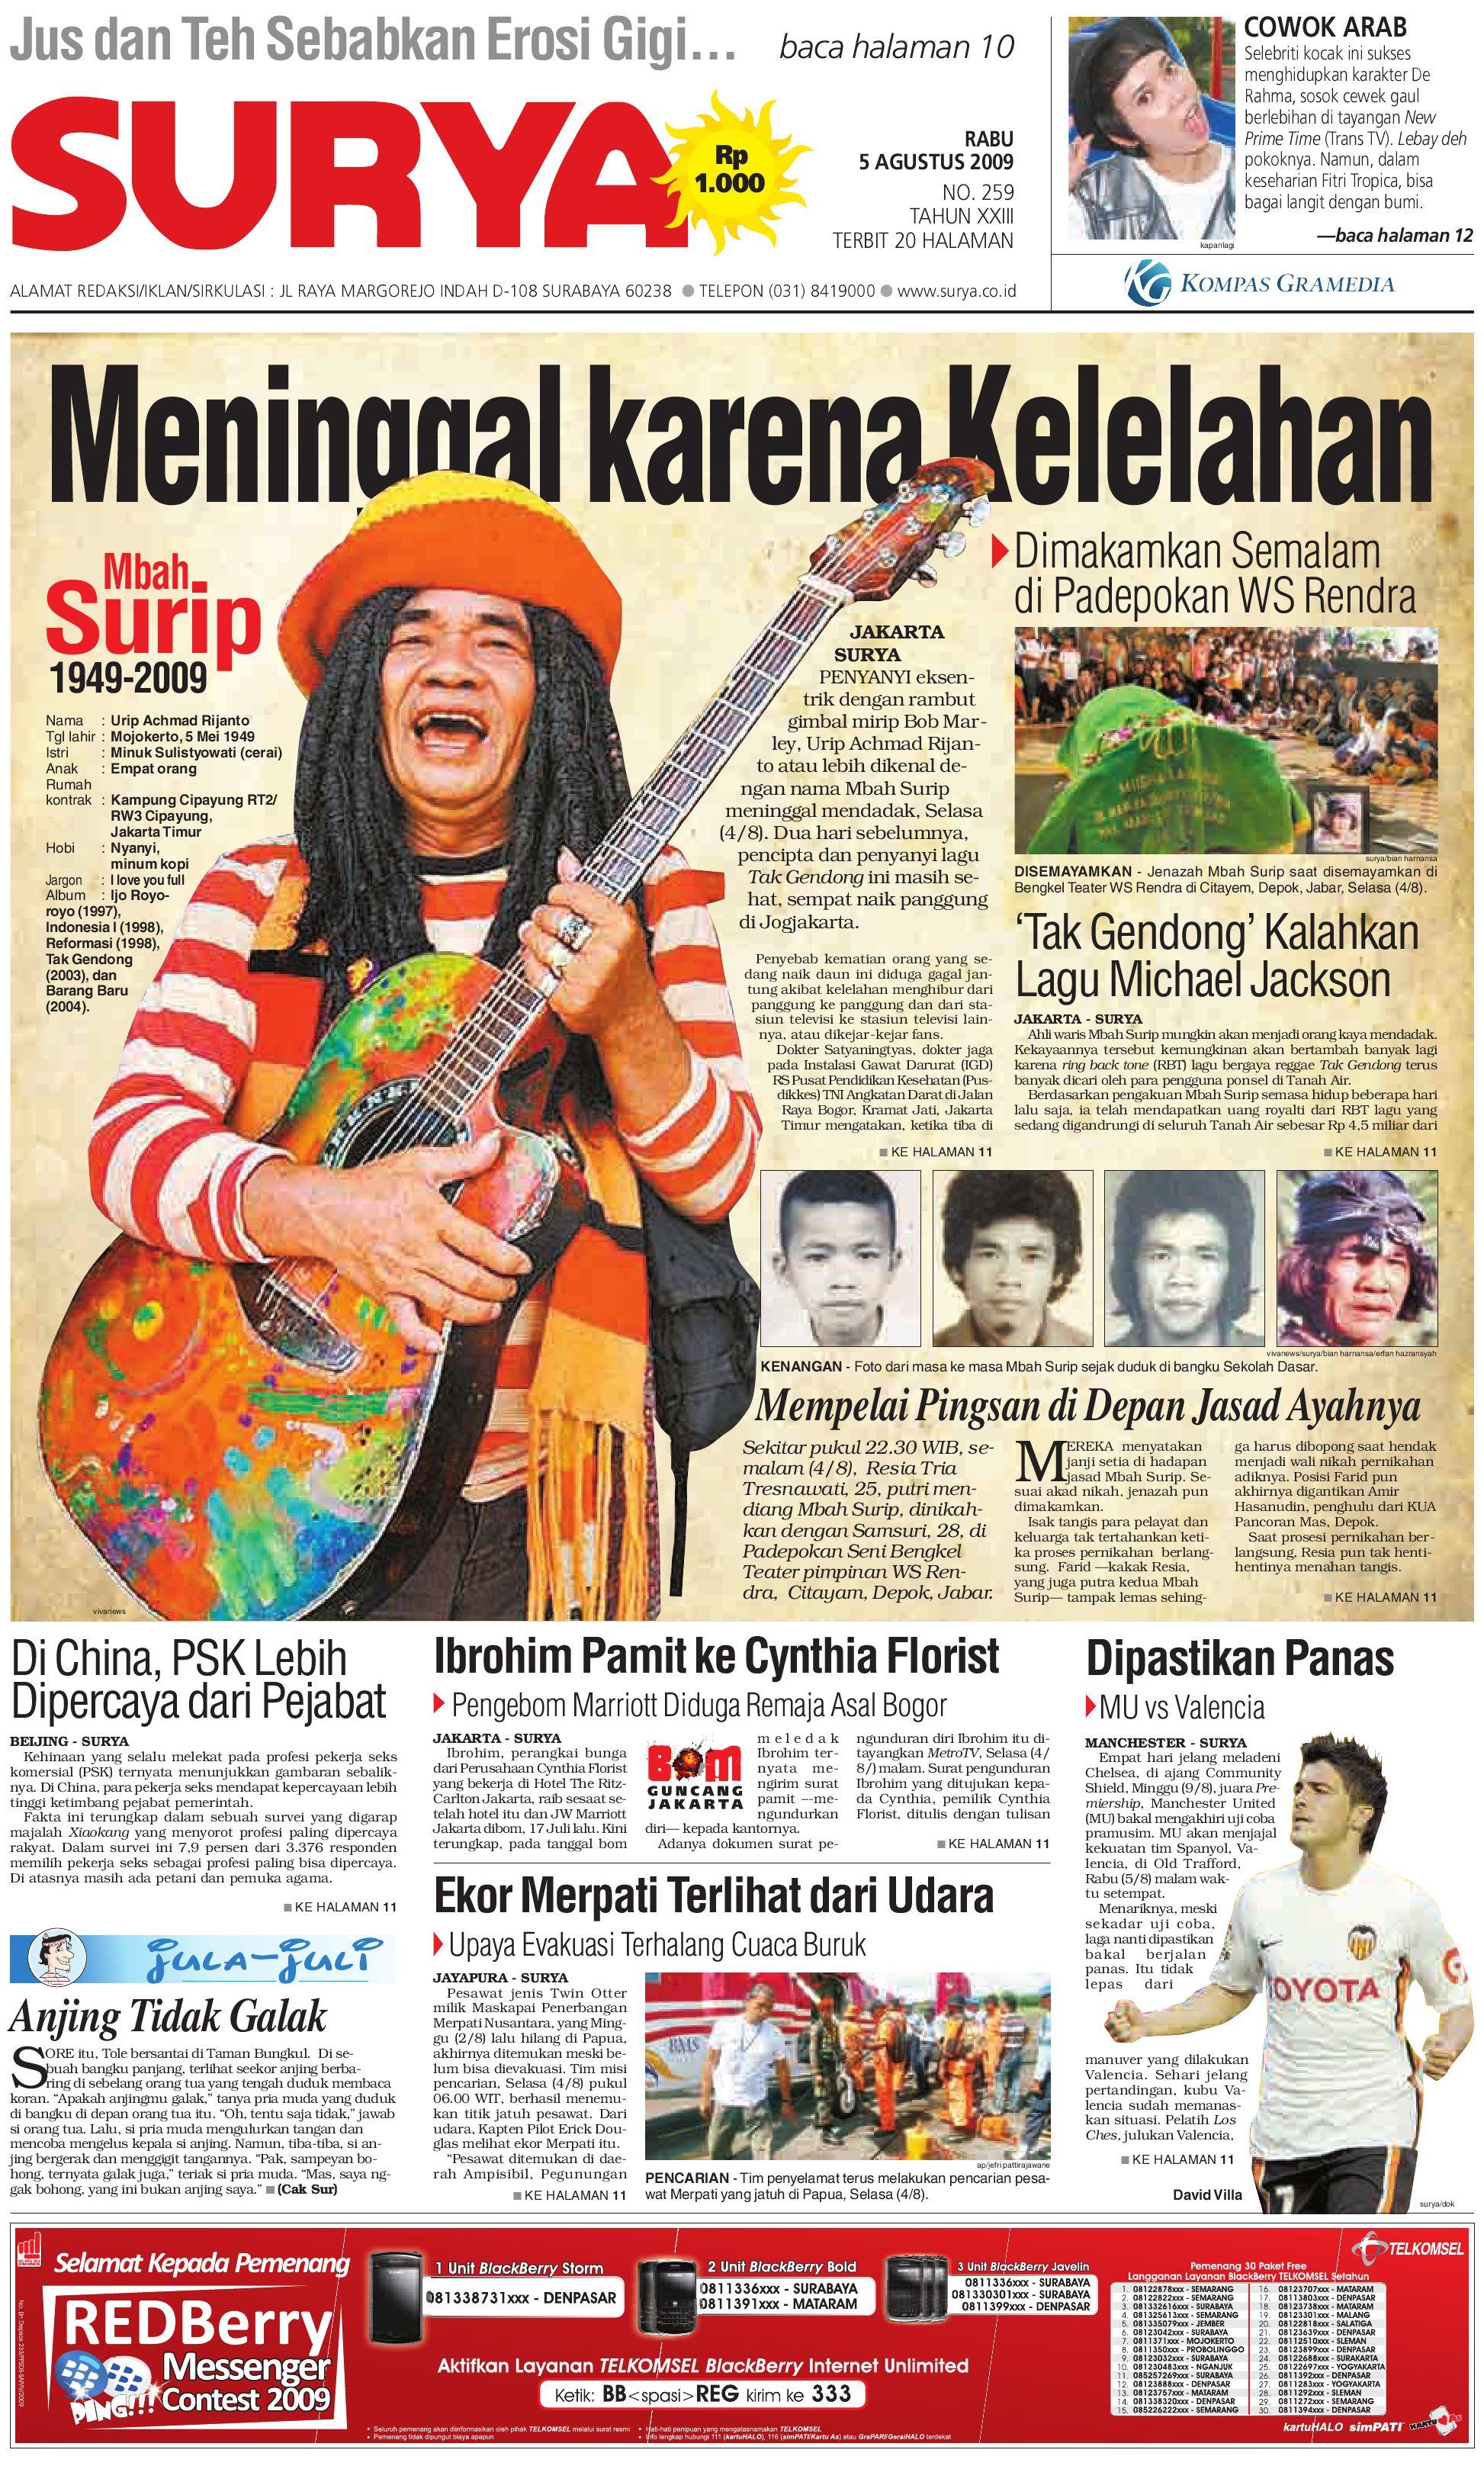 Surya Edisi Cetak 05 Agt 2009 By Harian SURYA Issuu